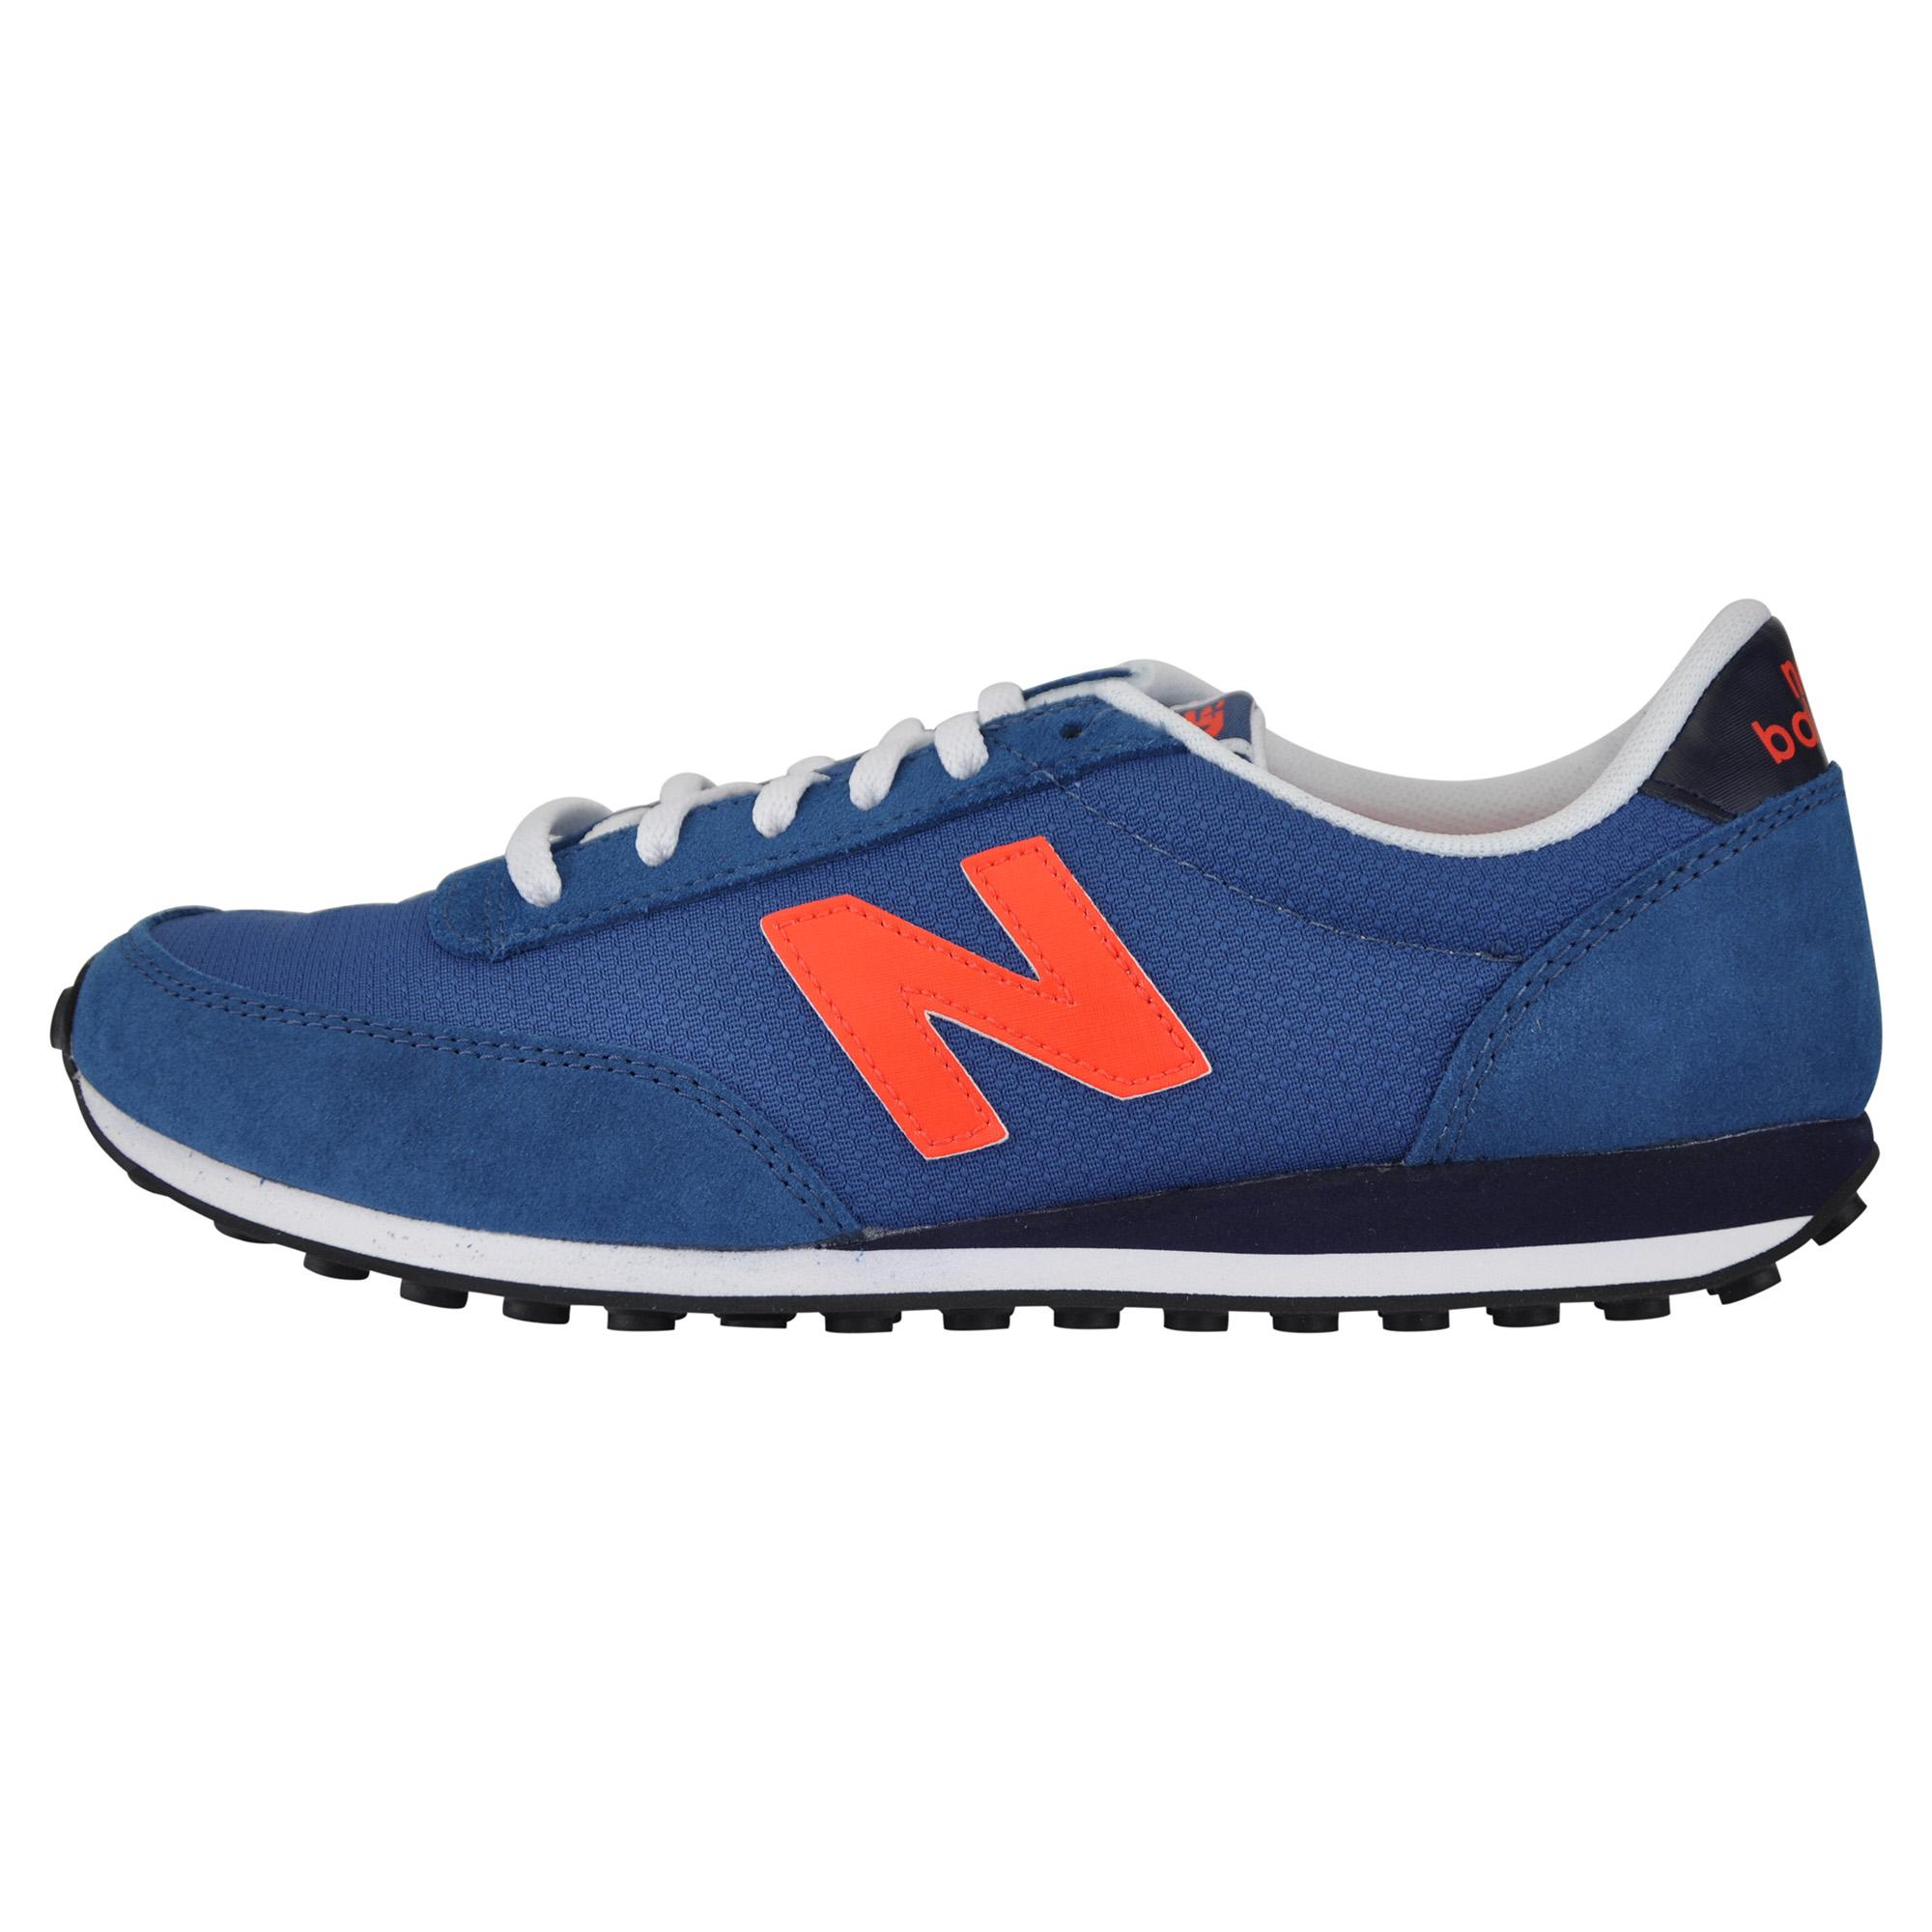 New Balance ML574 WR996 Sneaker ML373 WL410 WL373 WR996 Laufschuhe Sneaker WR996 Freizeitschuh 05123f